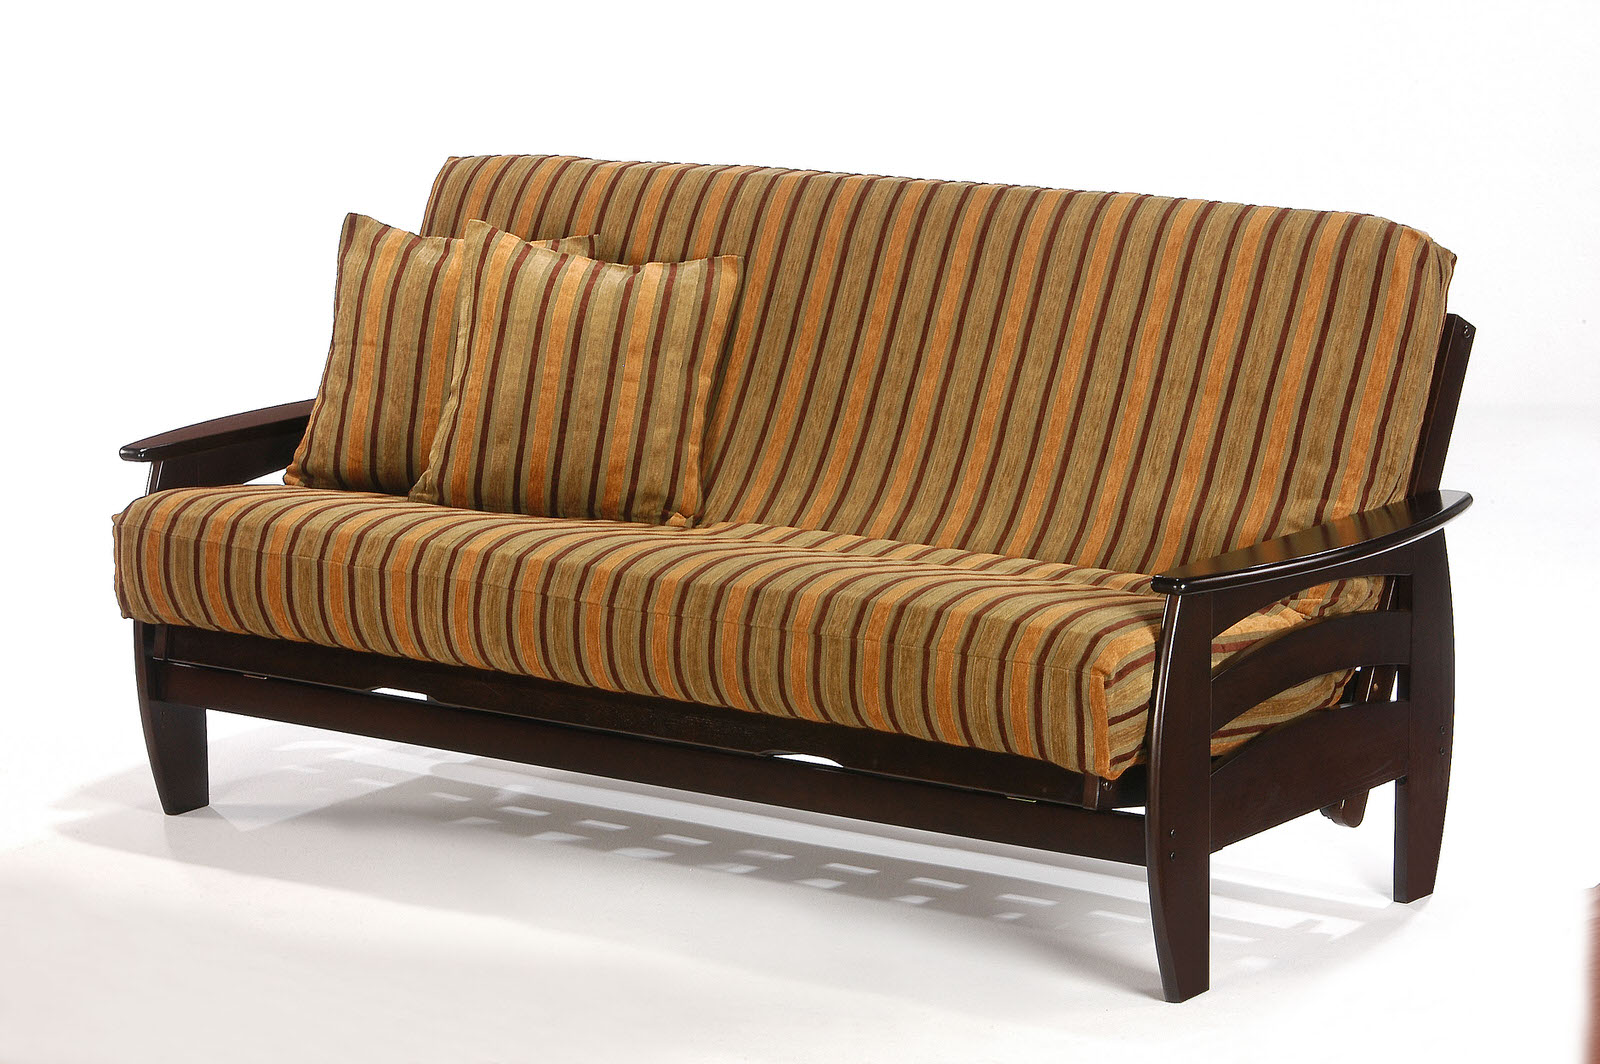 Corona Standard Futon Frame By Night Day Furniture